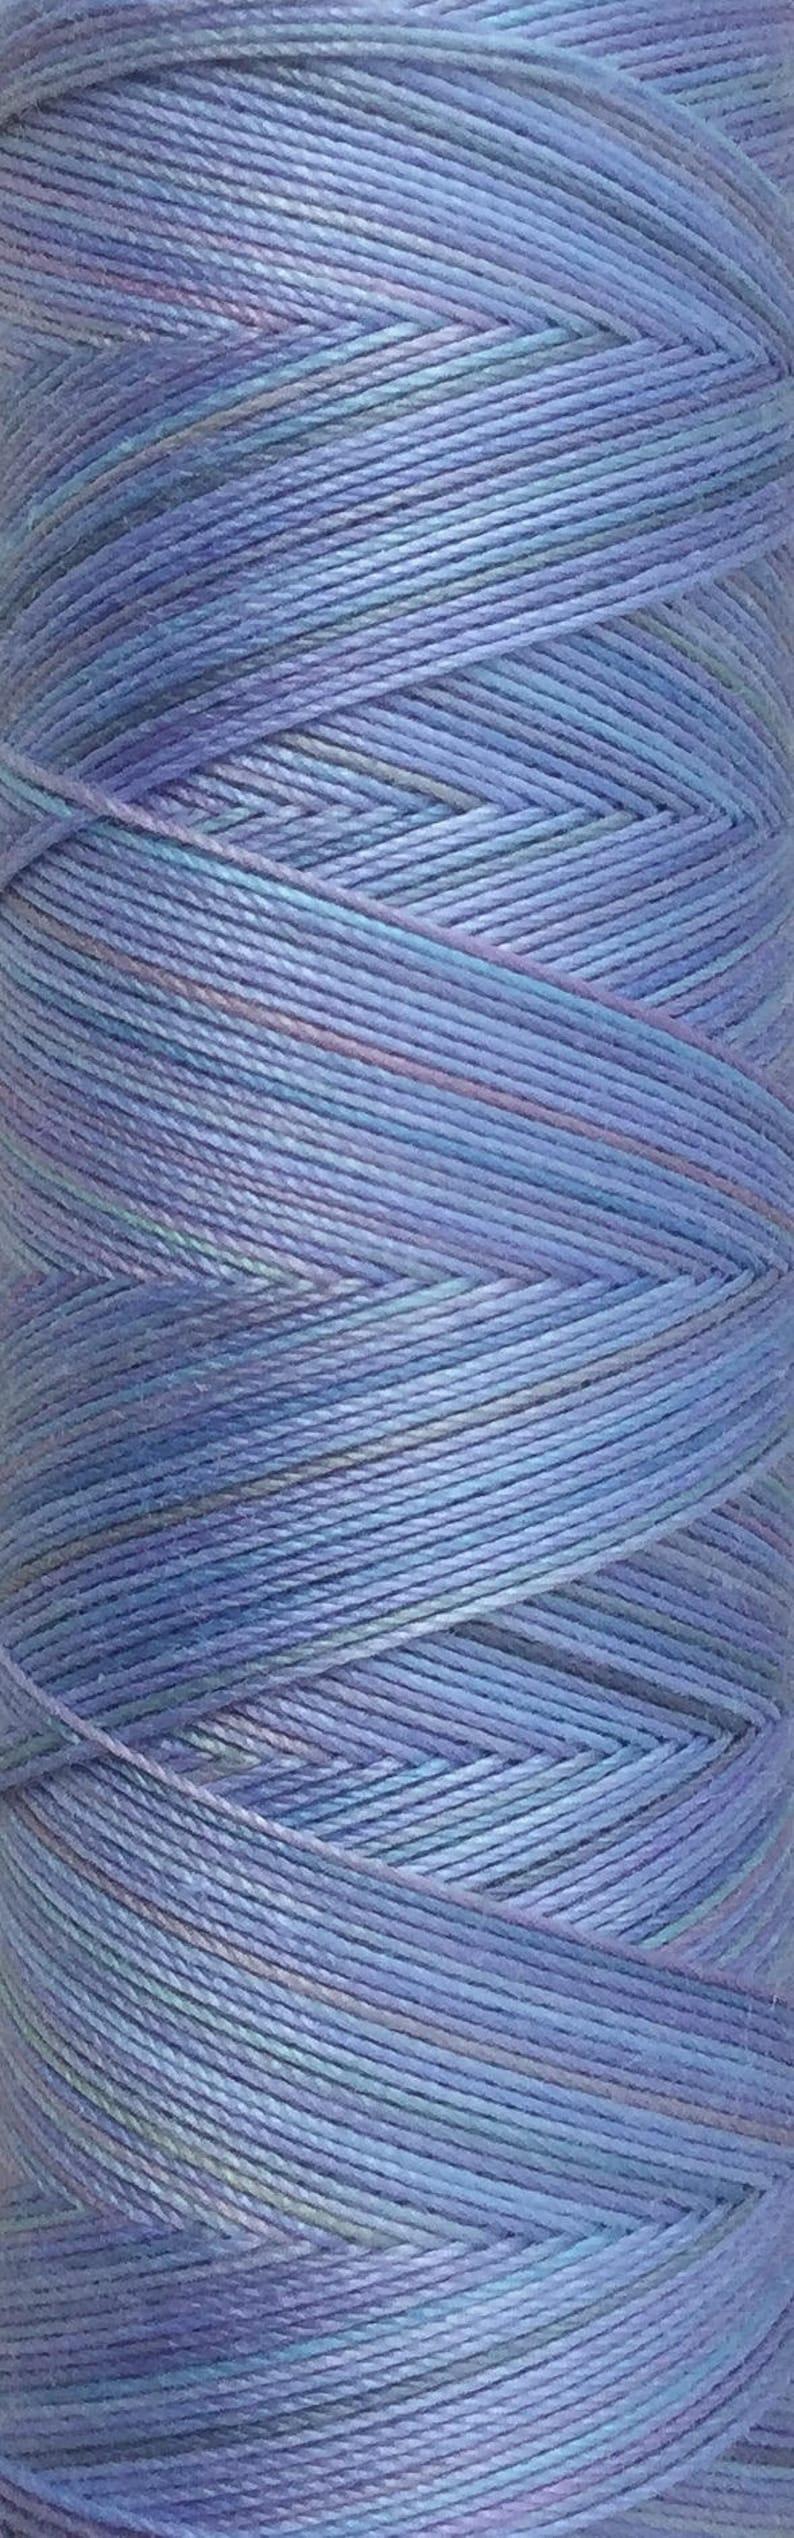 No.80 Sky Blue Pink Hand Dyed Cotton Machine Thread image 0